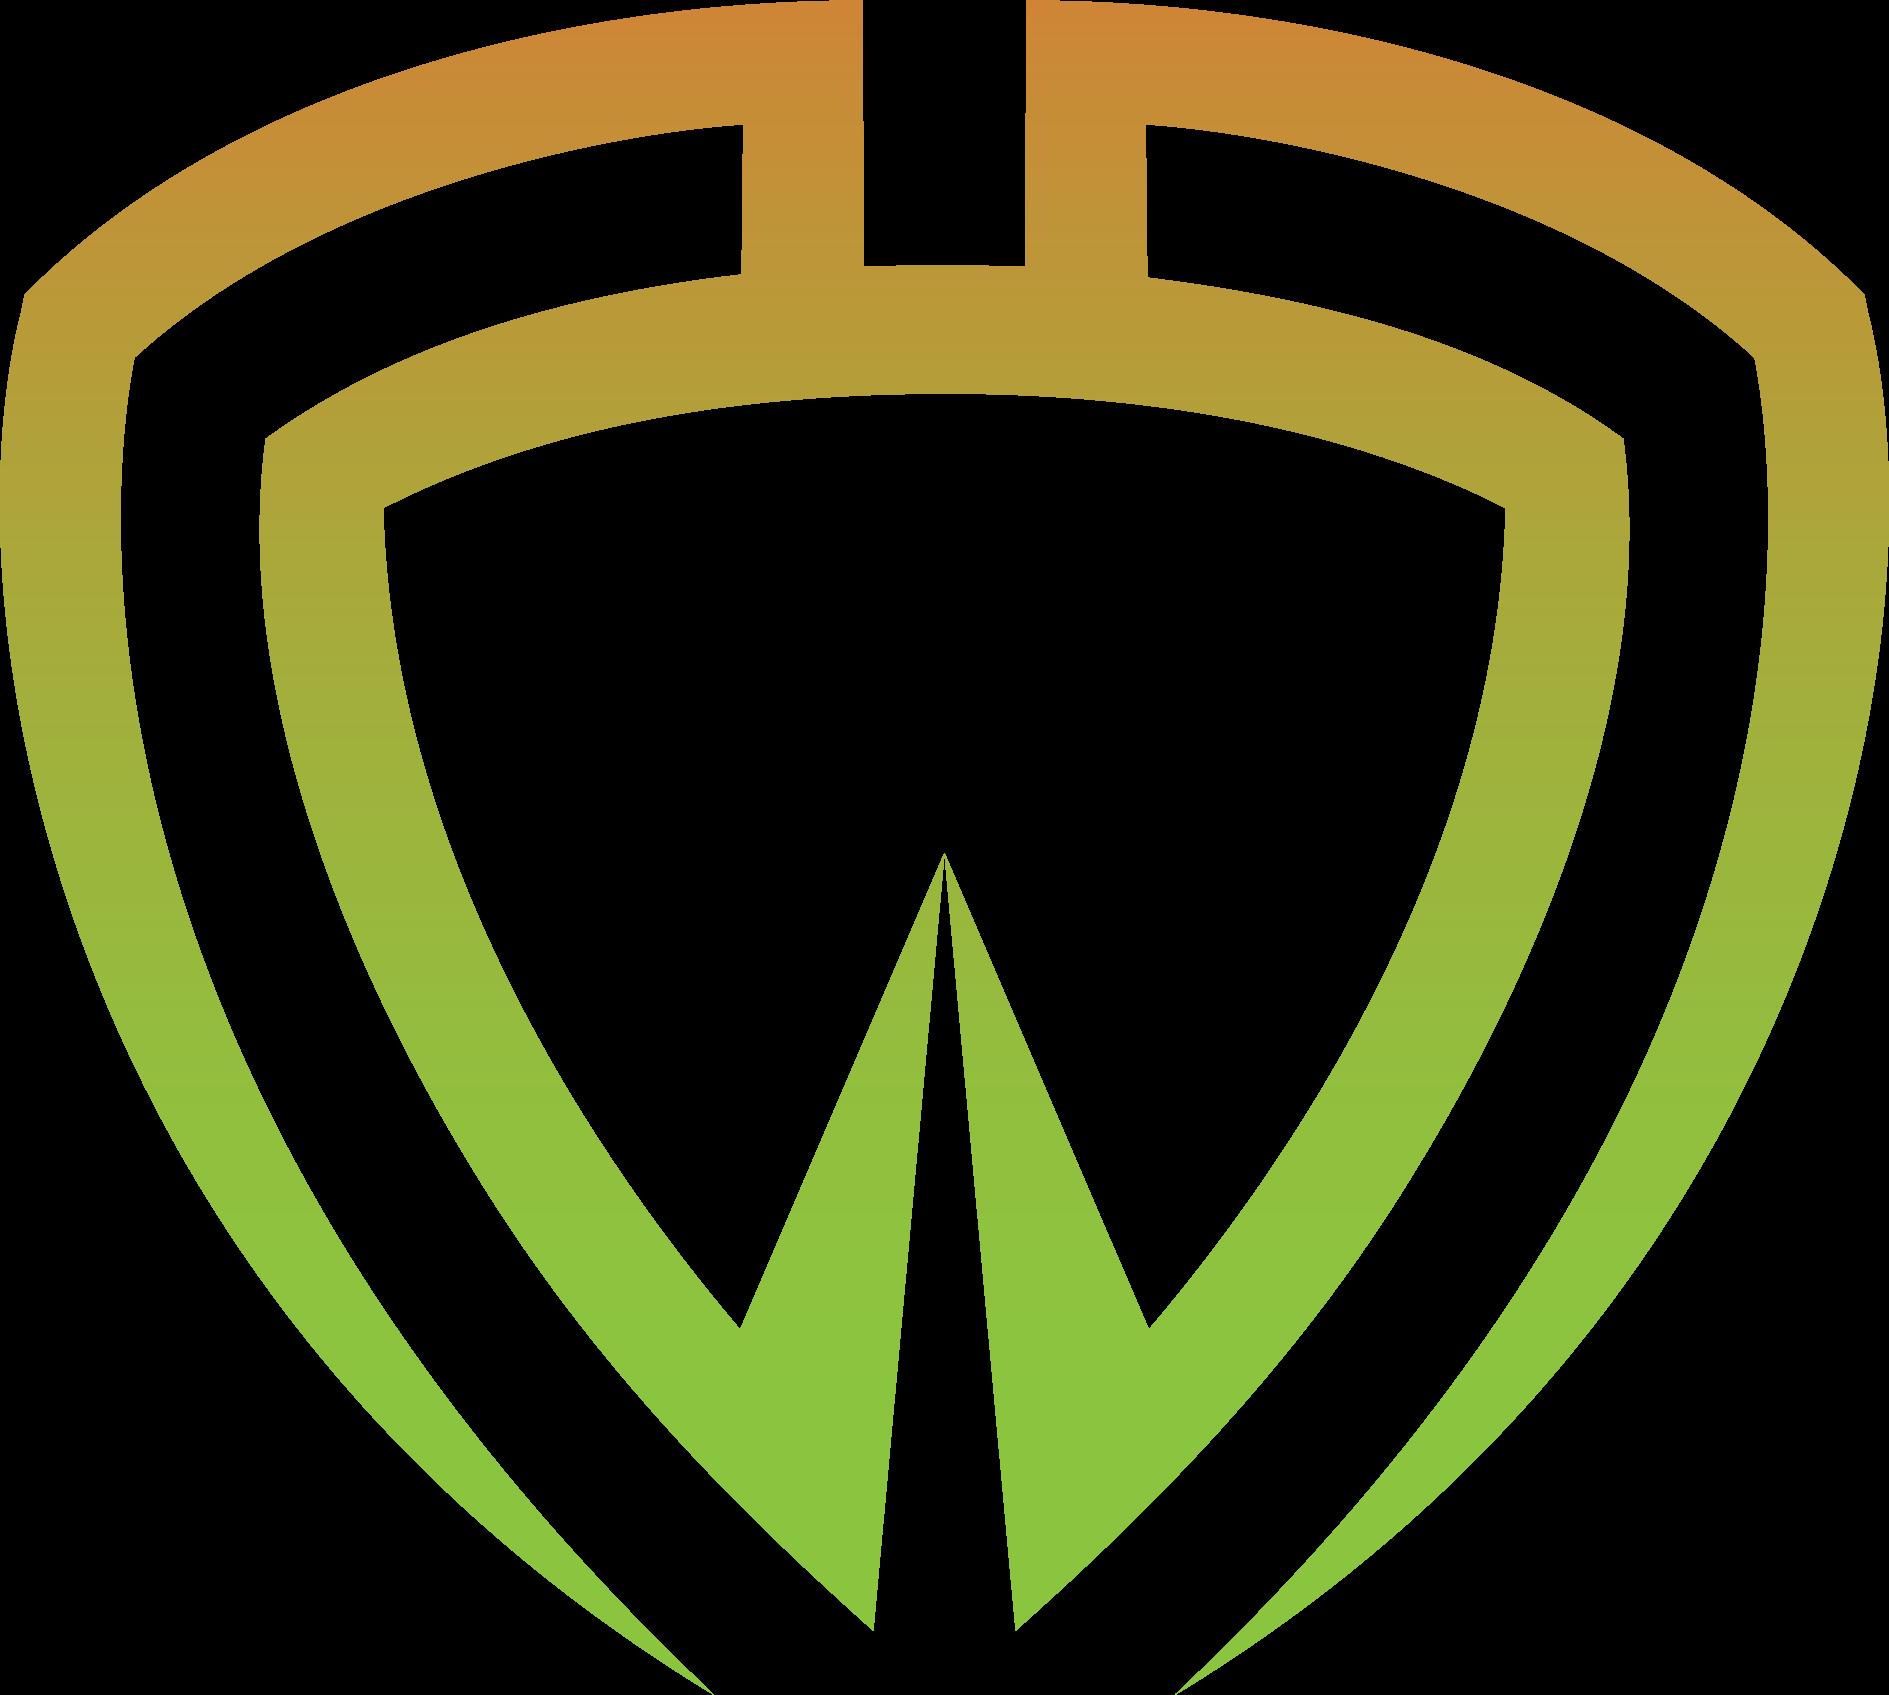 Wasabi Wallet